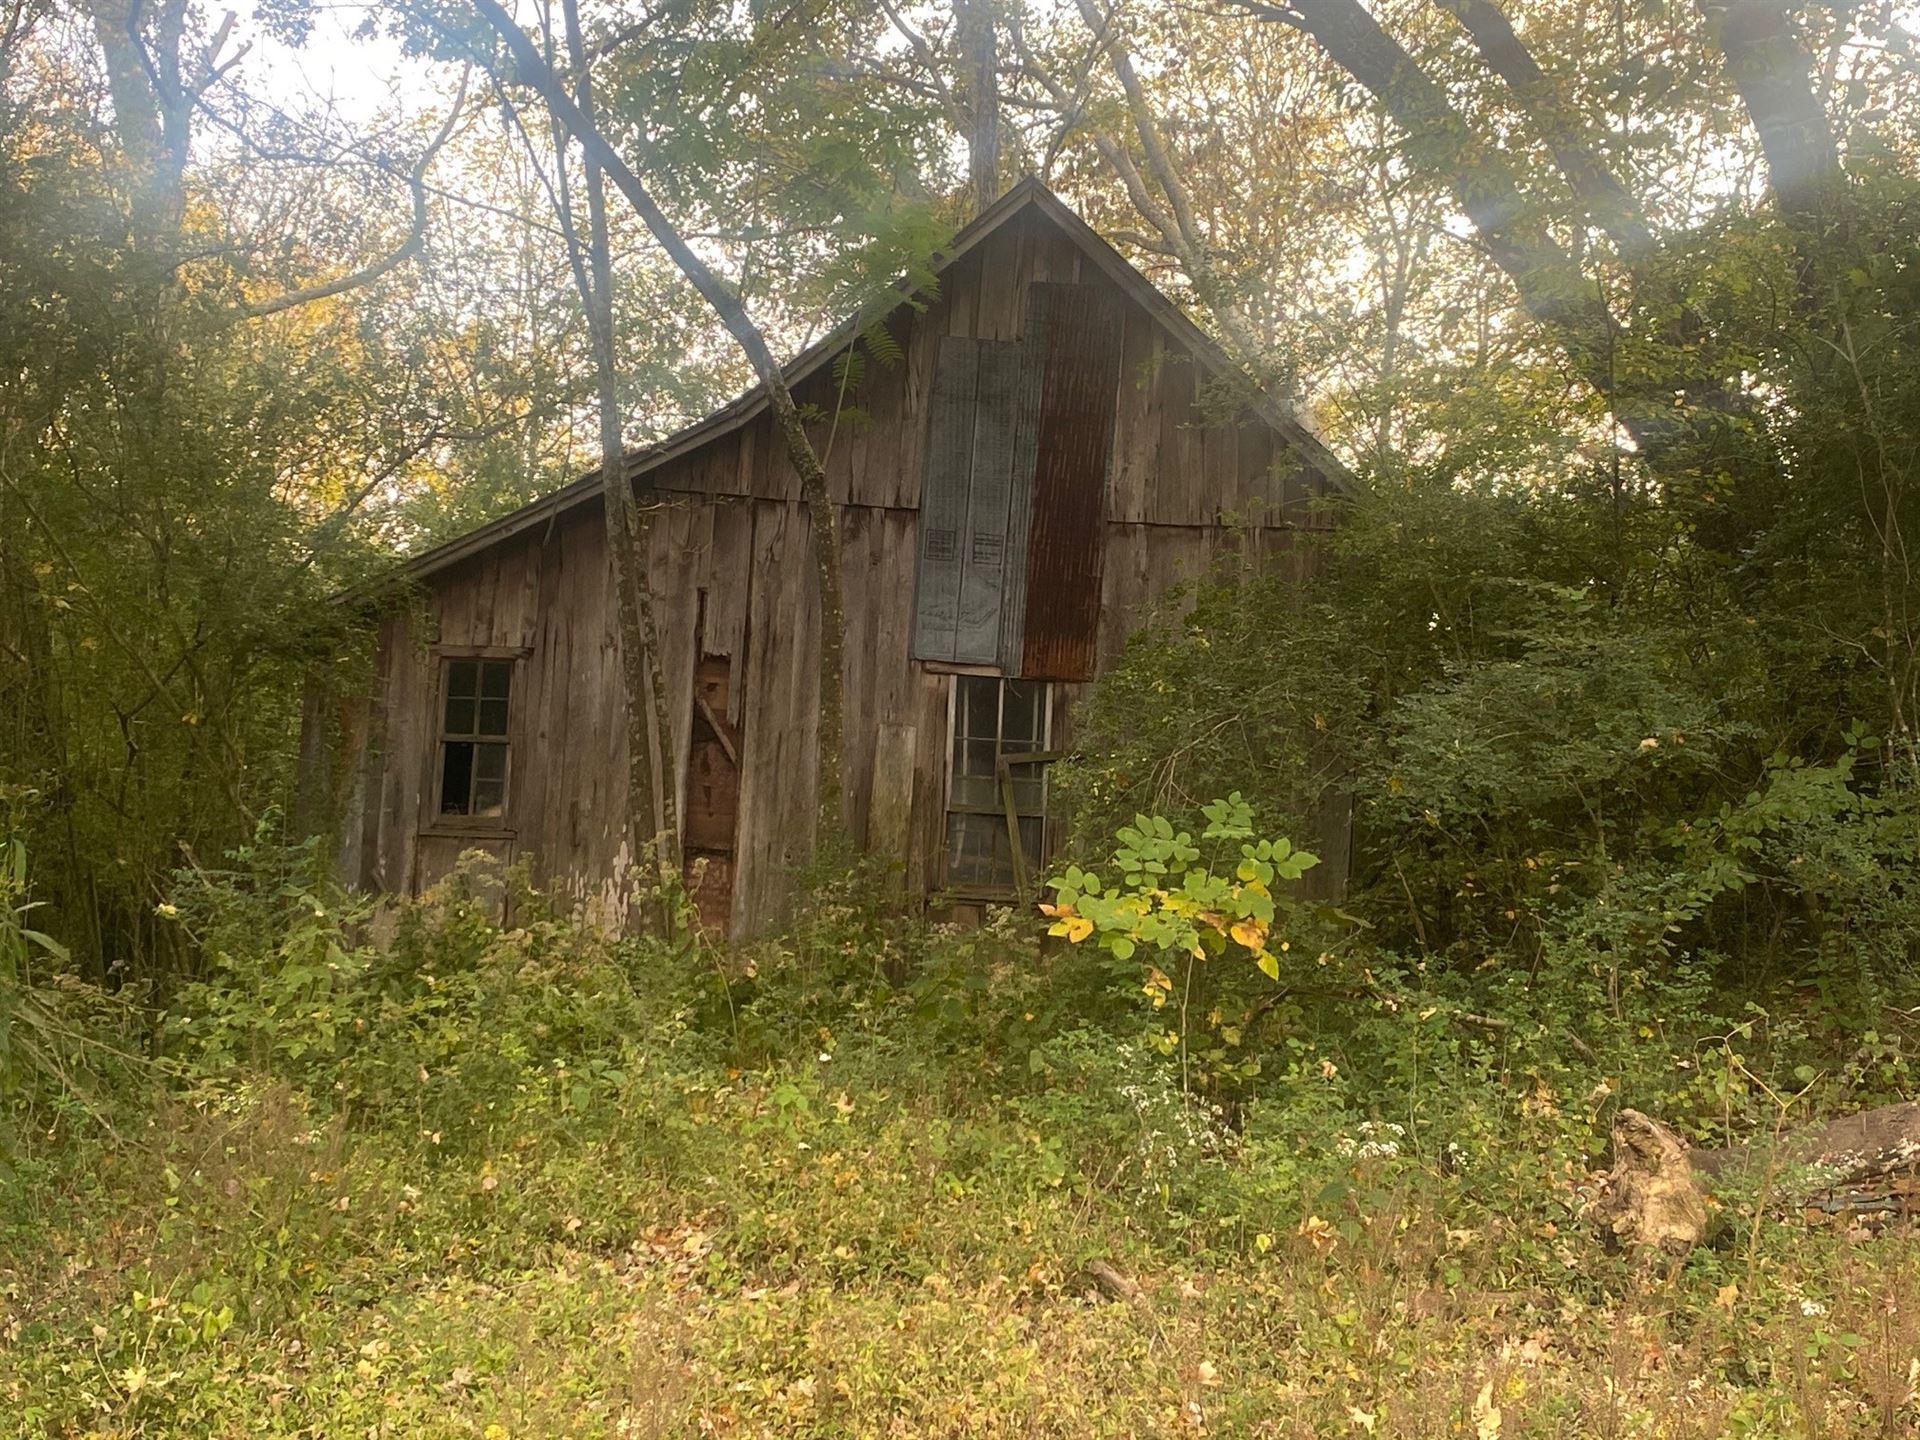 Photo of 160 Blooming Grove Rd, Pulaski, TN 38478 (MLS # 2200285)